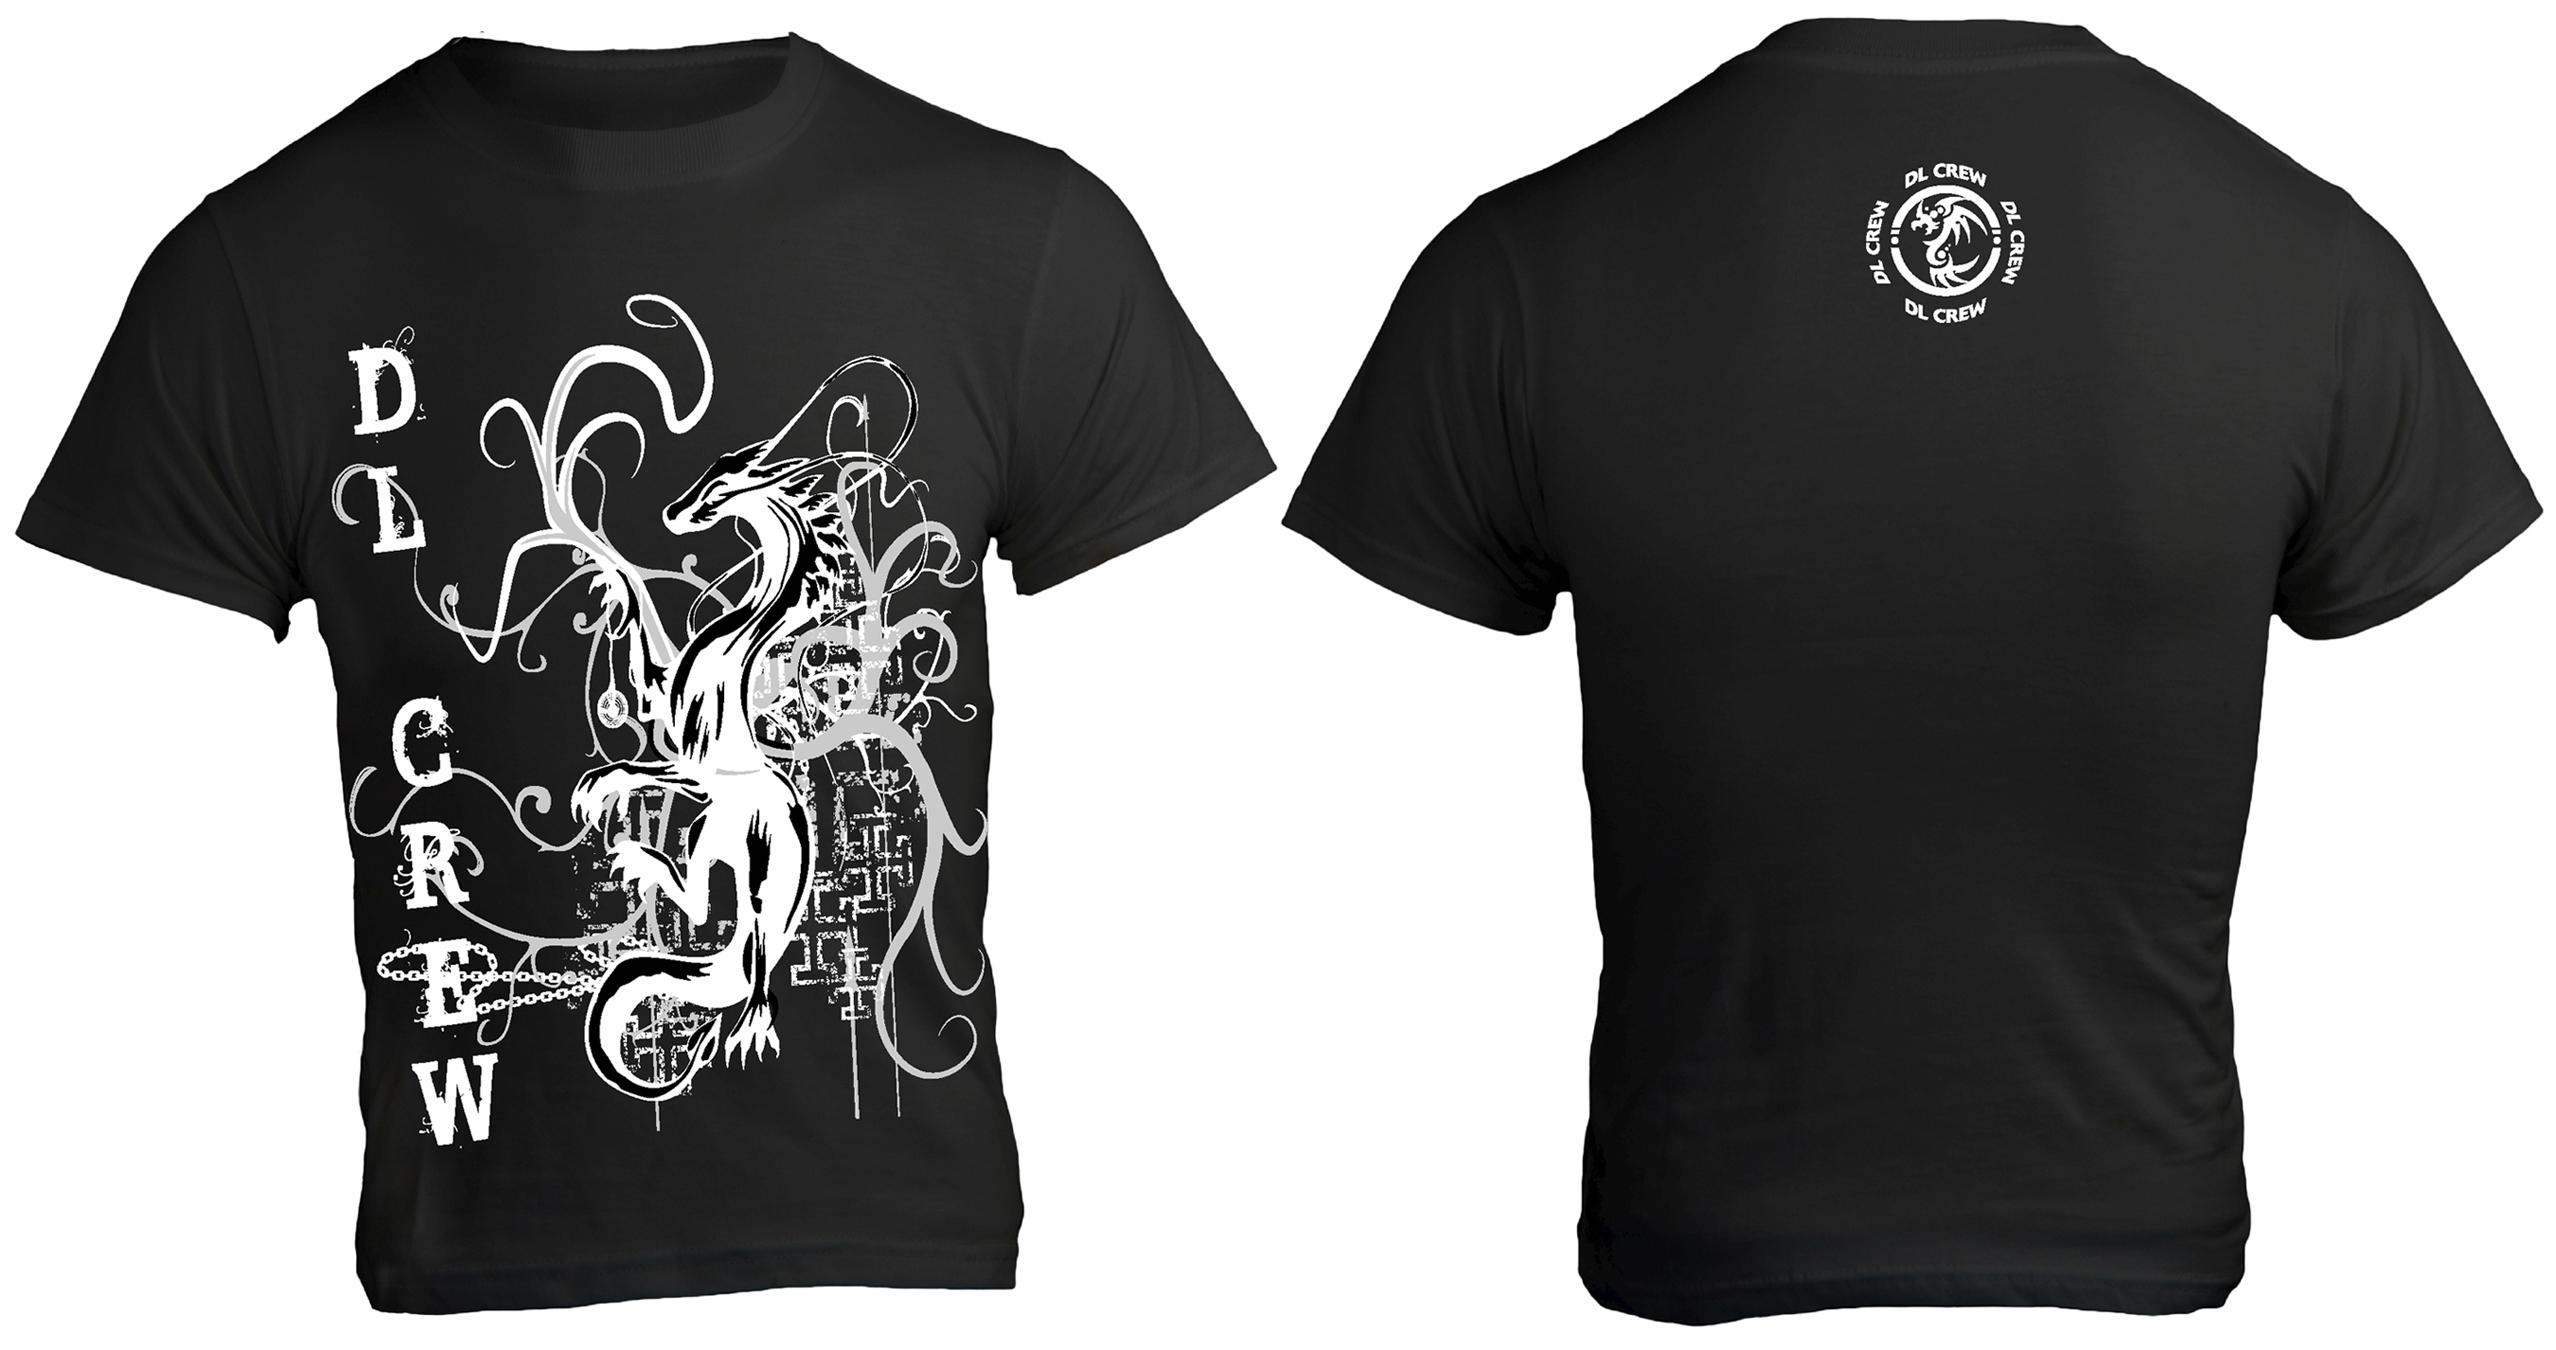 DL Crew Shirt